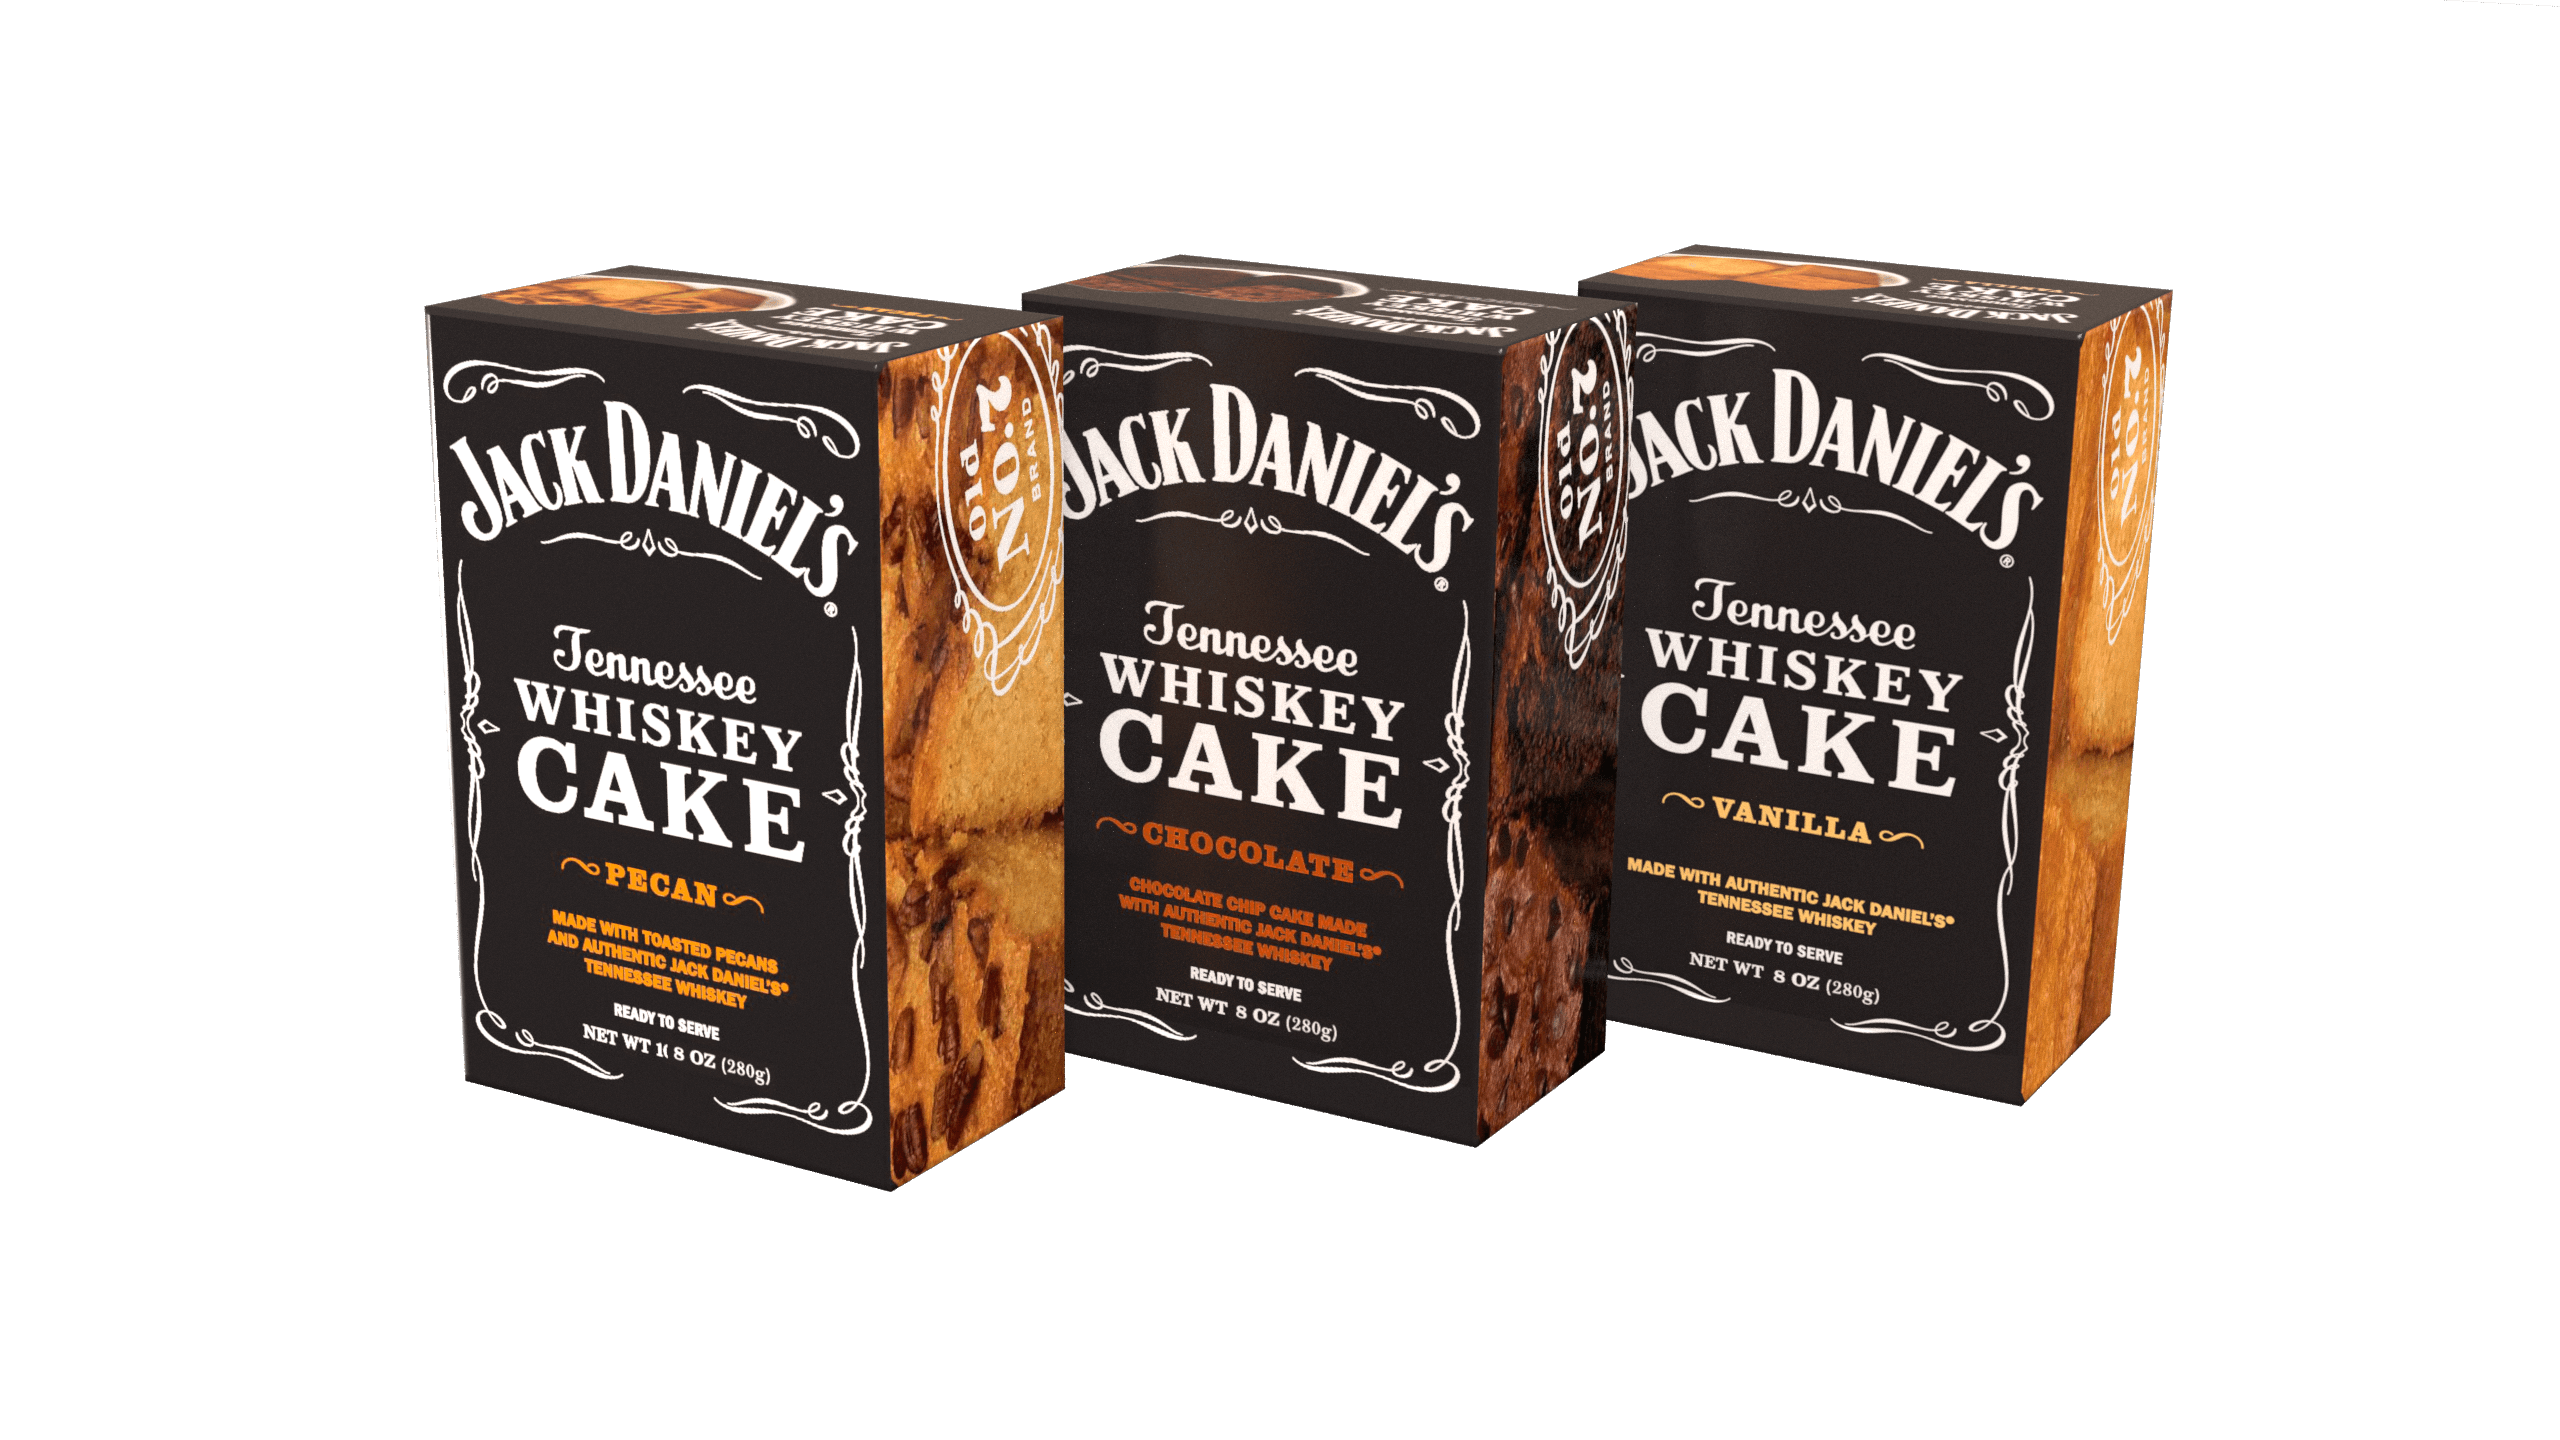 3-Pack of Jack Daniel's Tennessee Whiskey Cake - Variety Pack JD308VAR